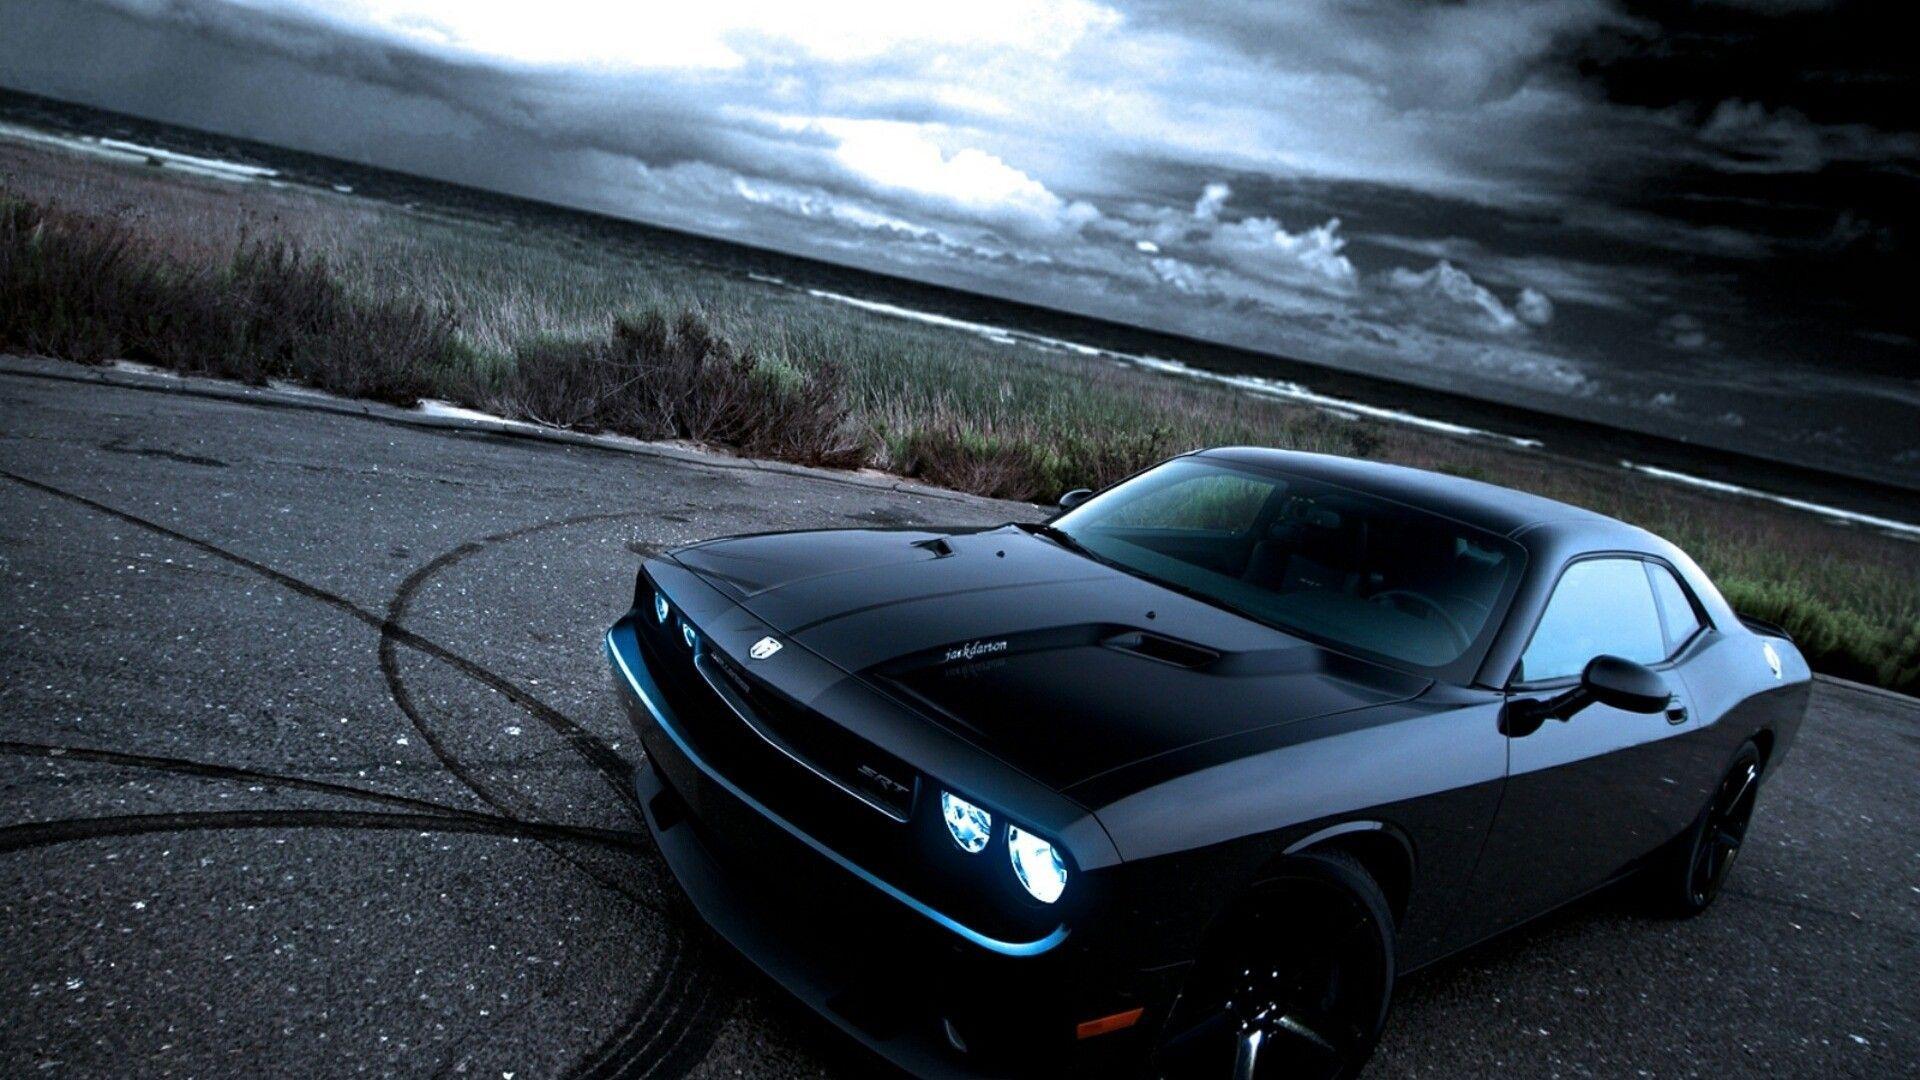 Elegant Car Wallpapers Muscle Car Wallpaper Muscle Cars Cars